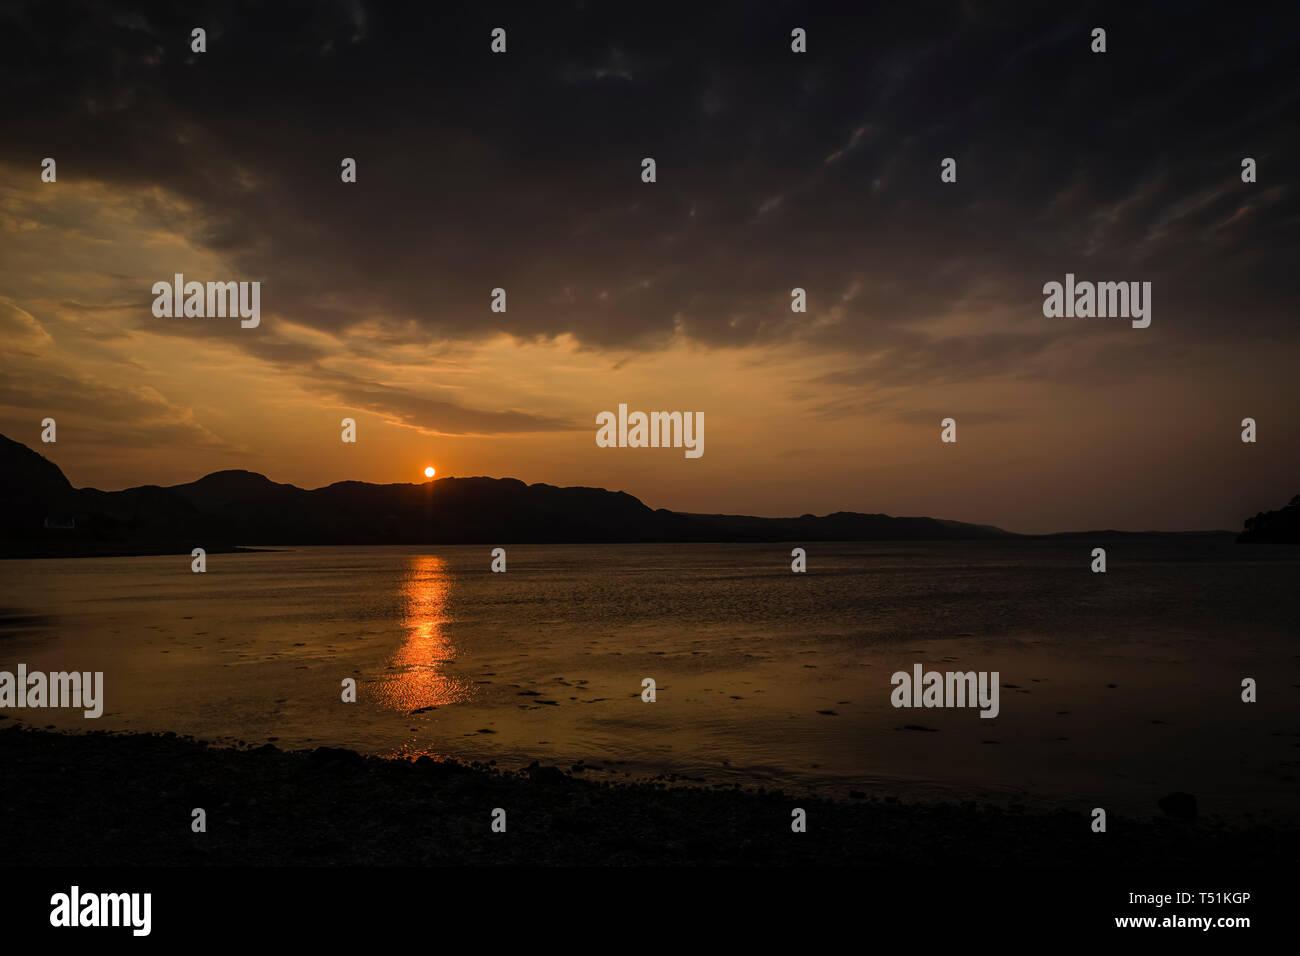 Sunset over Loch Ewe at Poolewe, Scotland Stock Photo